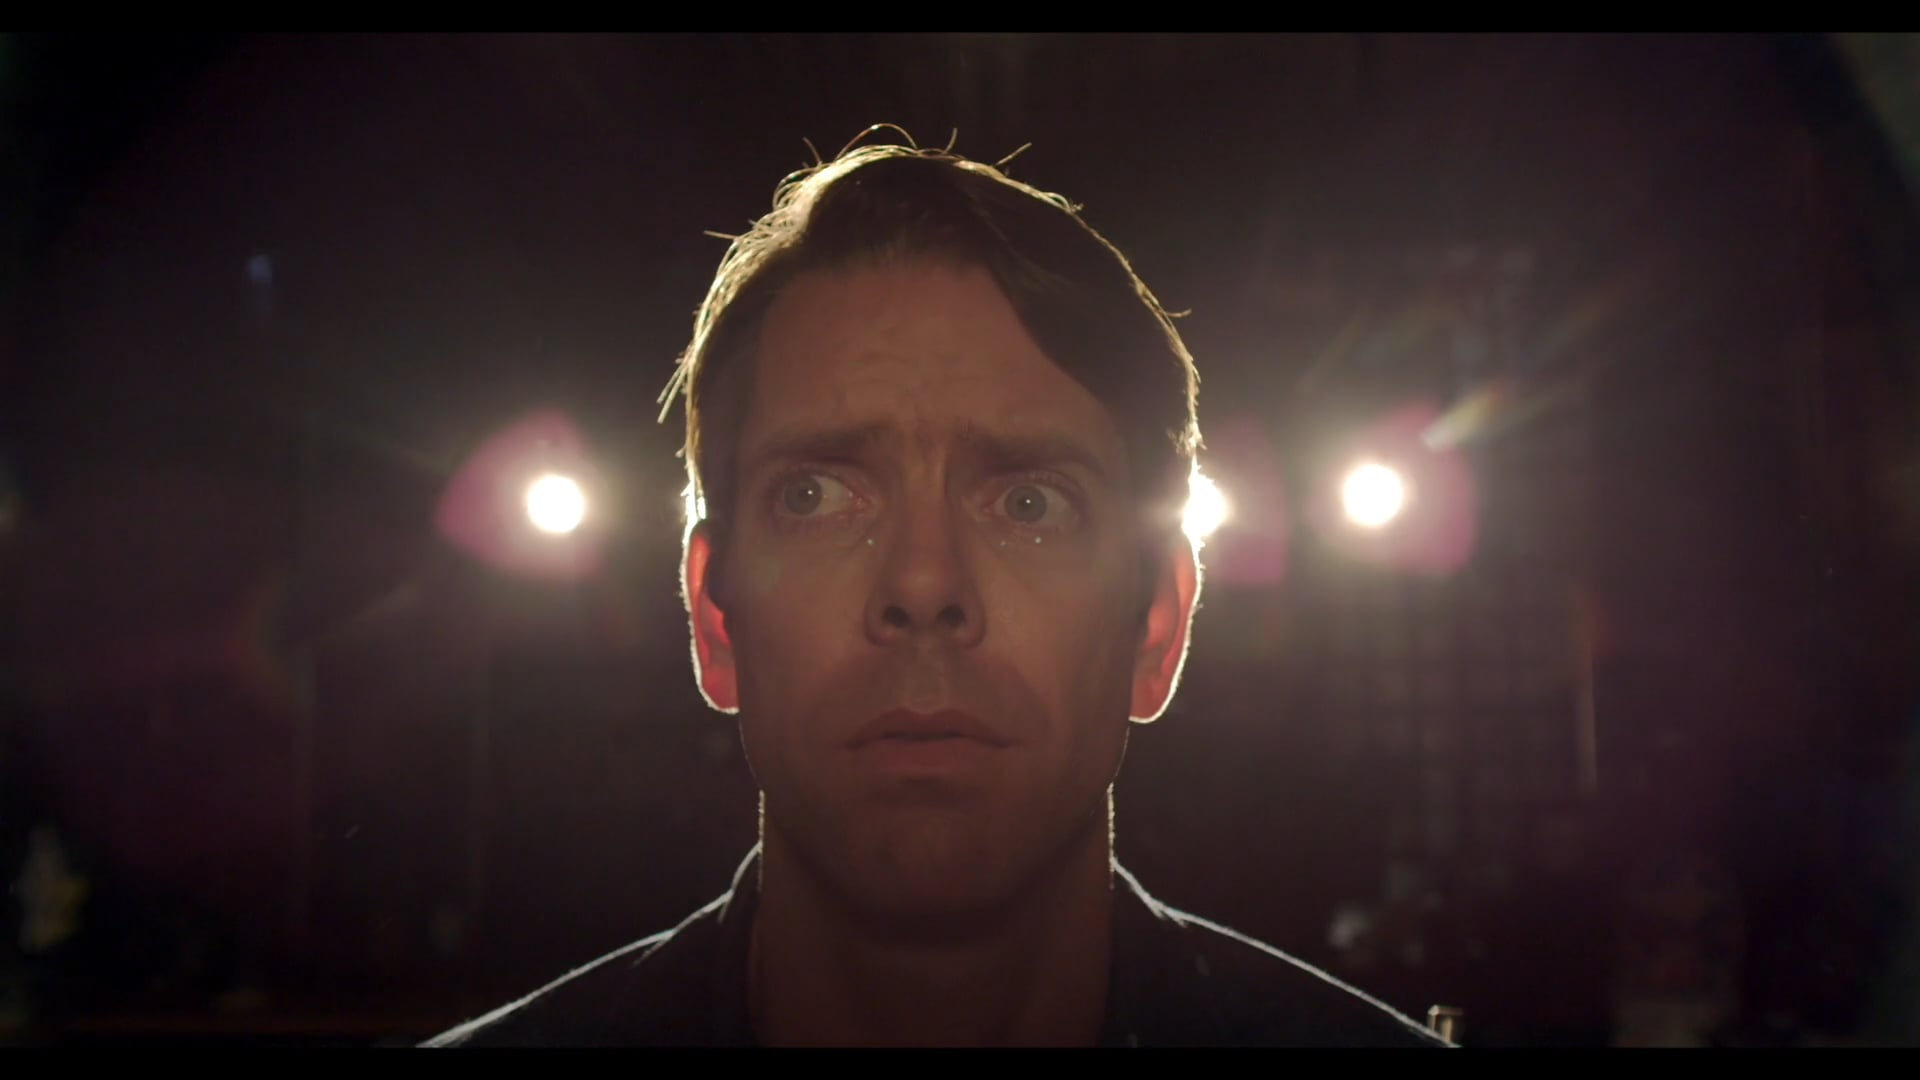 The Origins of Wit & Humor Trailer - The DimeStore Cut